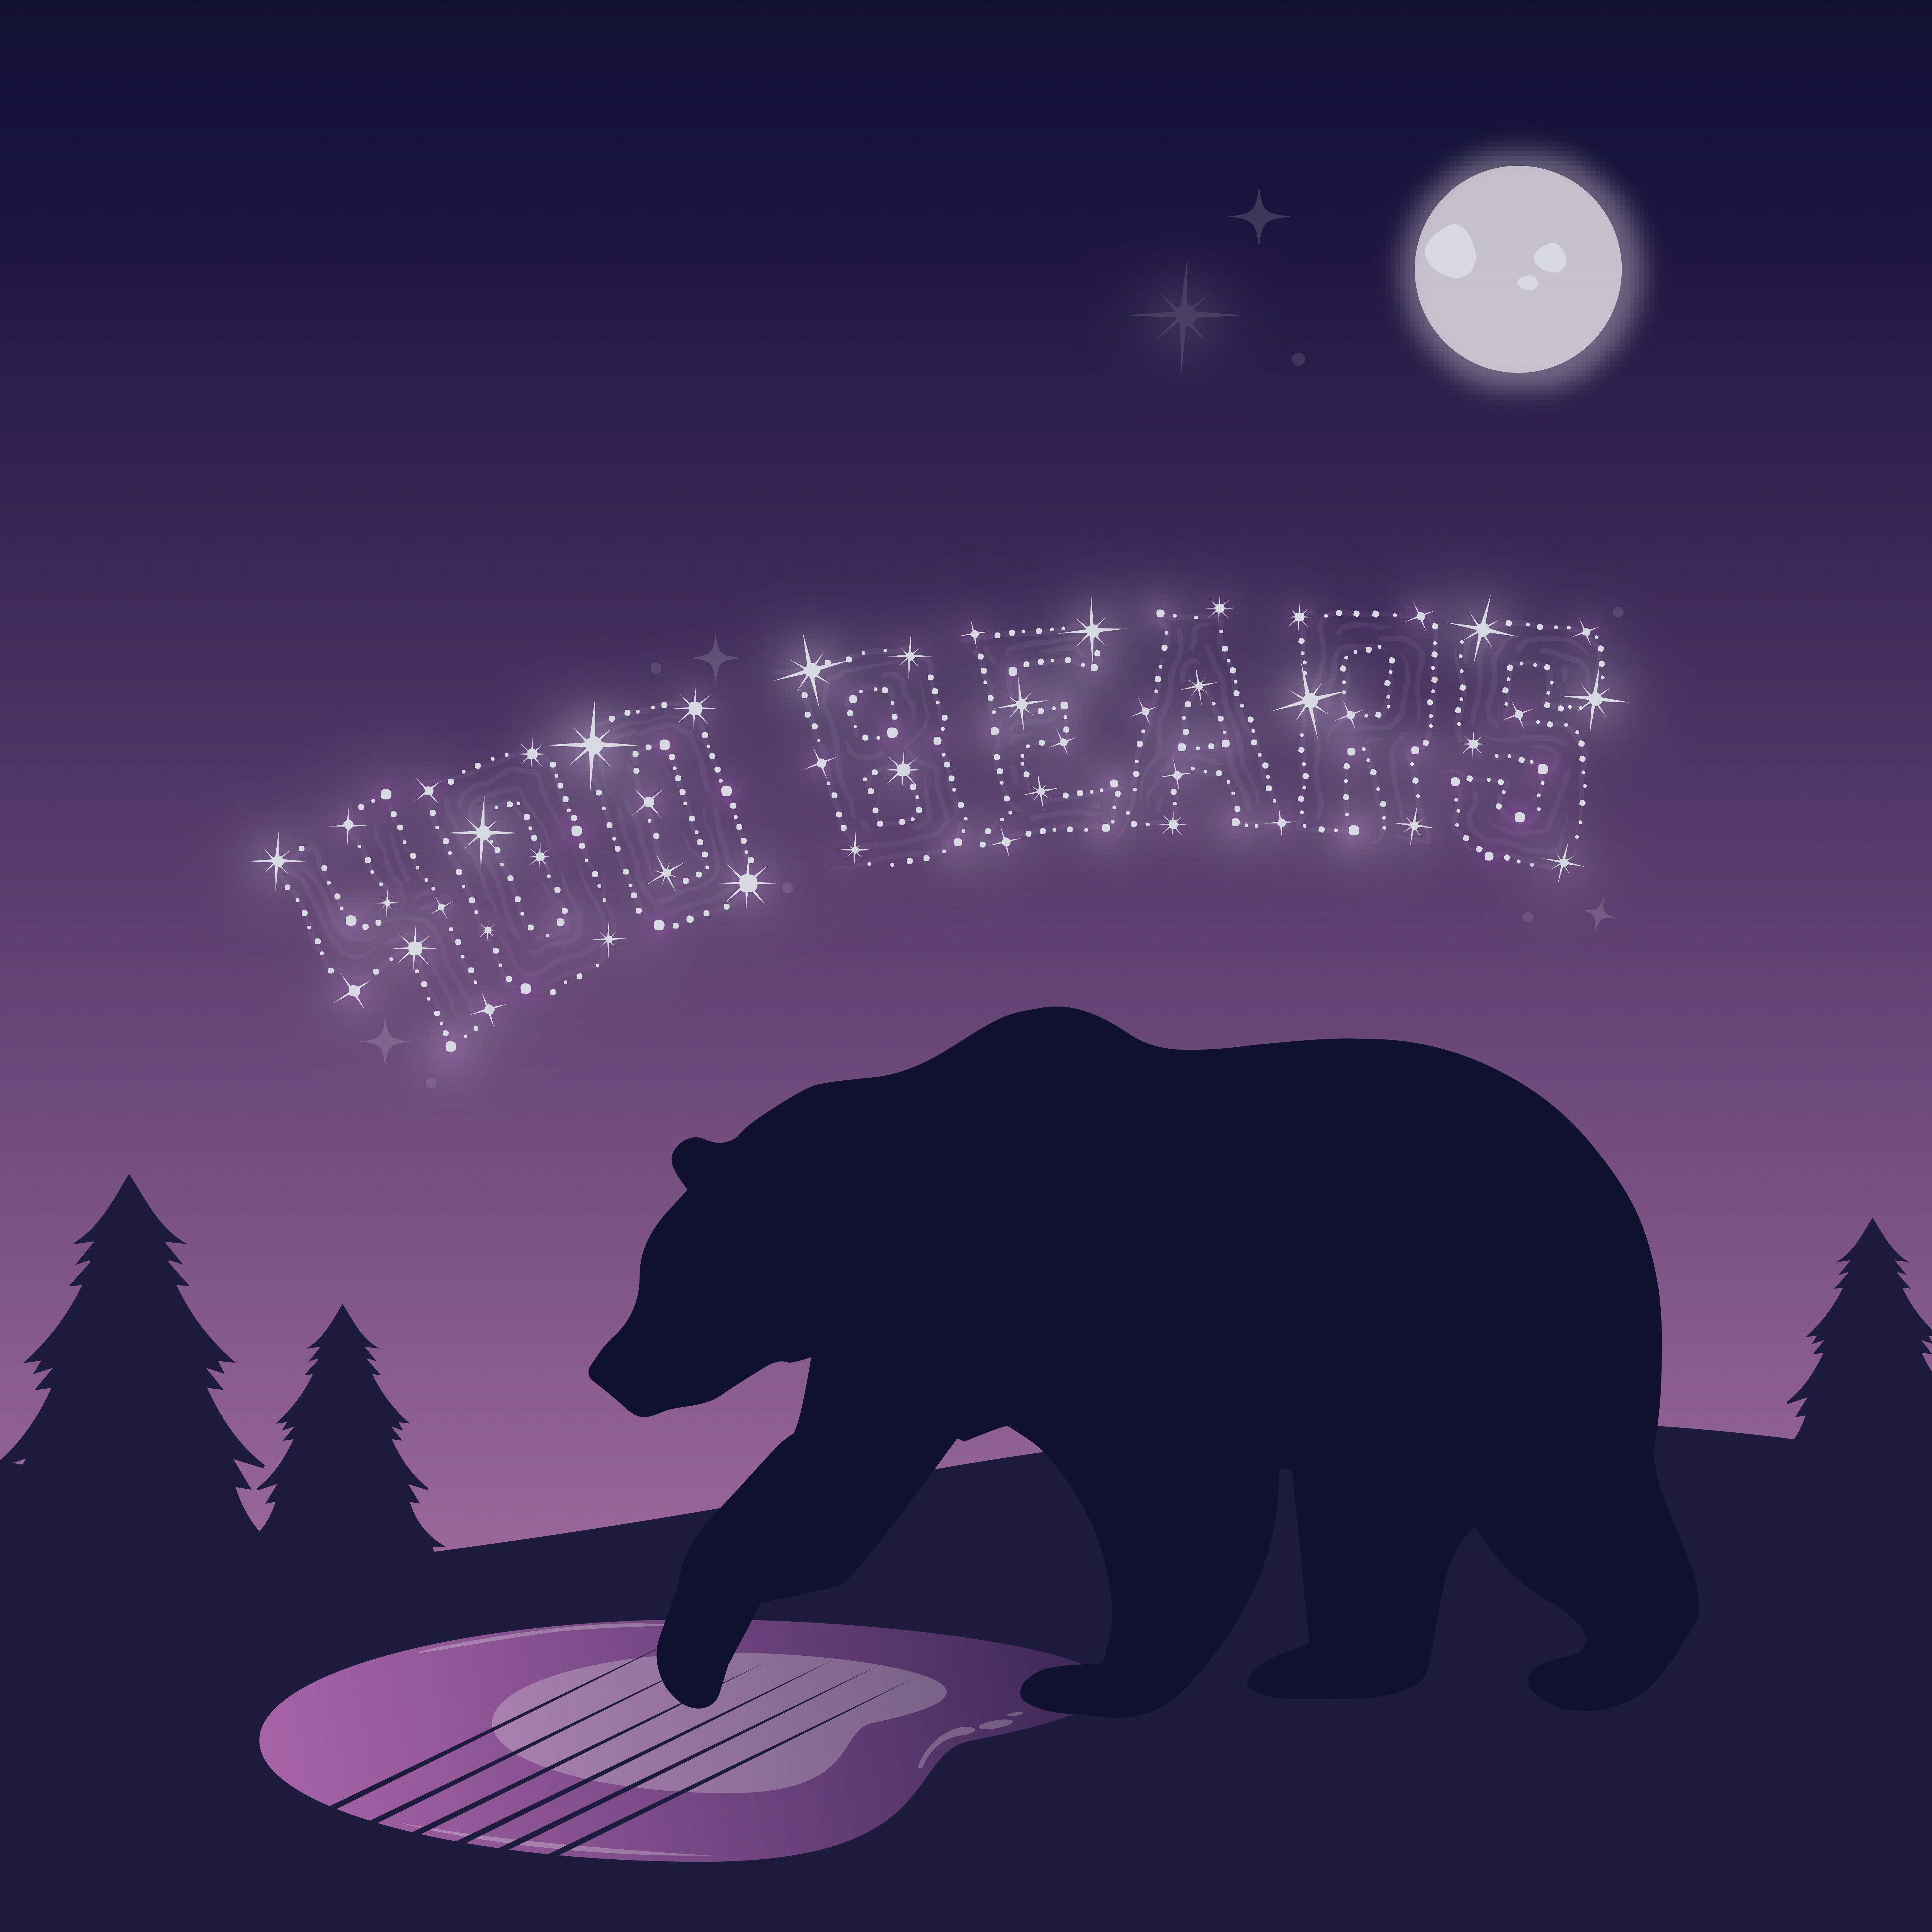 Art for Good Bear by 400 Bears